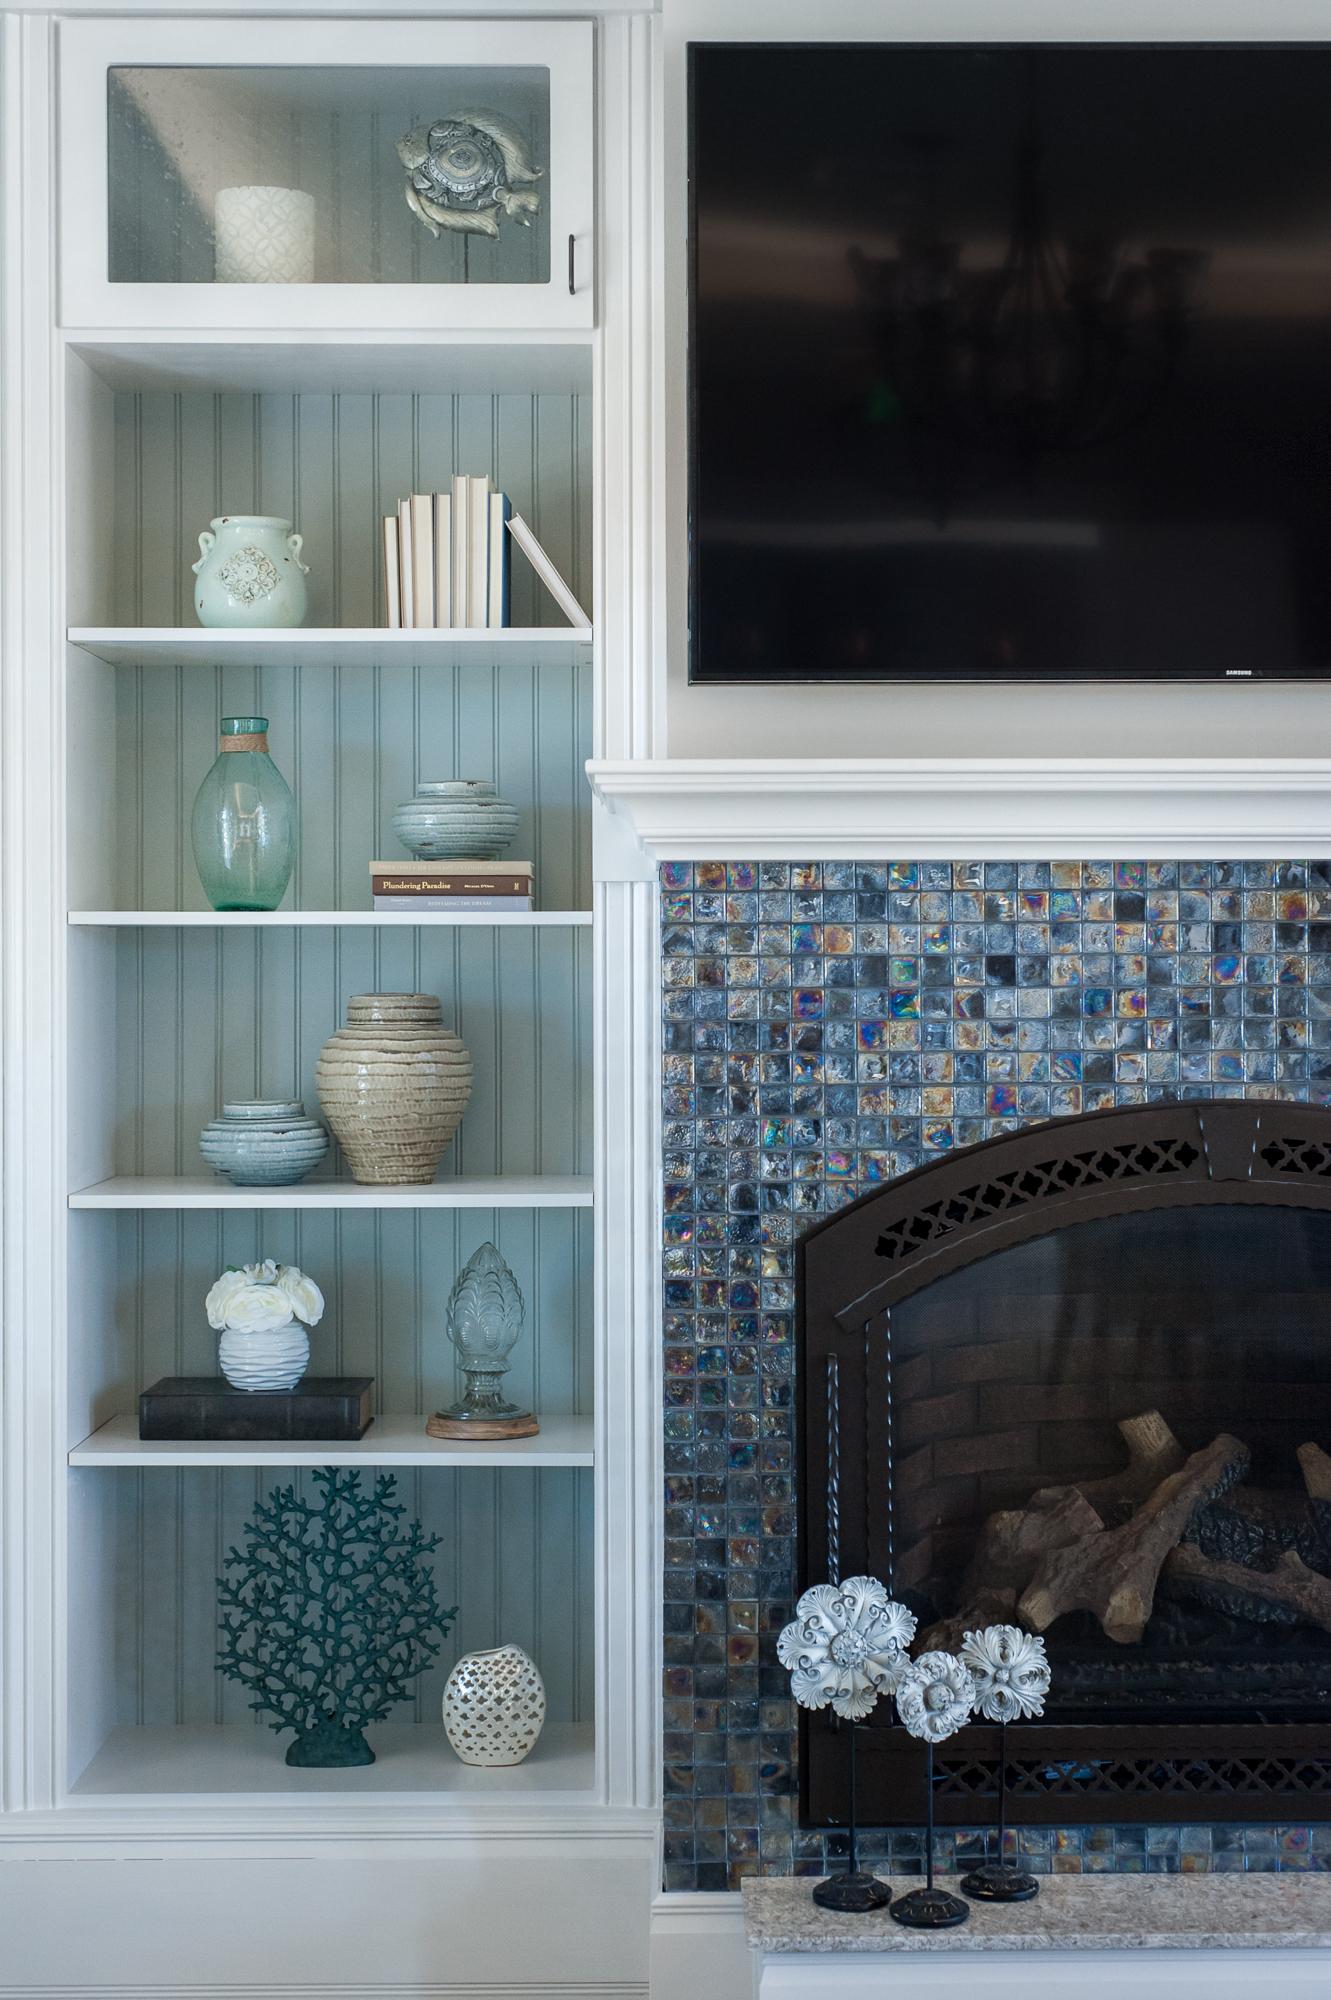 Micamy_Design_Studio_Interior_Design_Artisan_Lakes_Clubhouse_Serene_Coastal_Glass_Mosaic_Tile_Backsplash_Fireplace_SherwinWilliams_Crossville_Blue_ (4).jpg